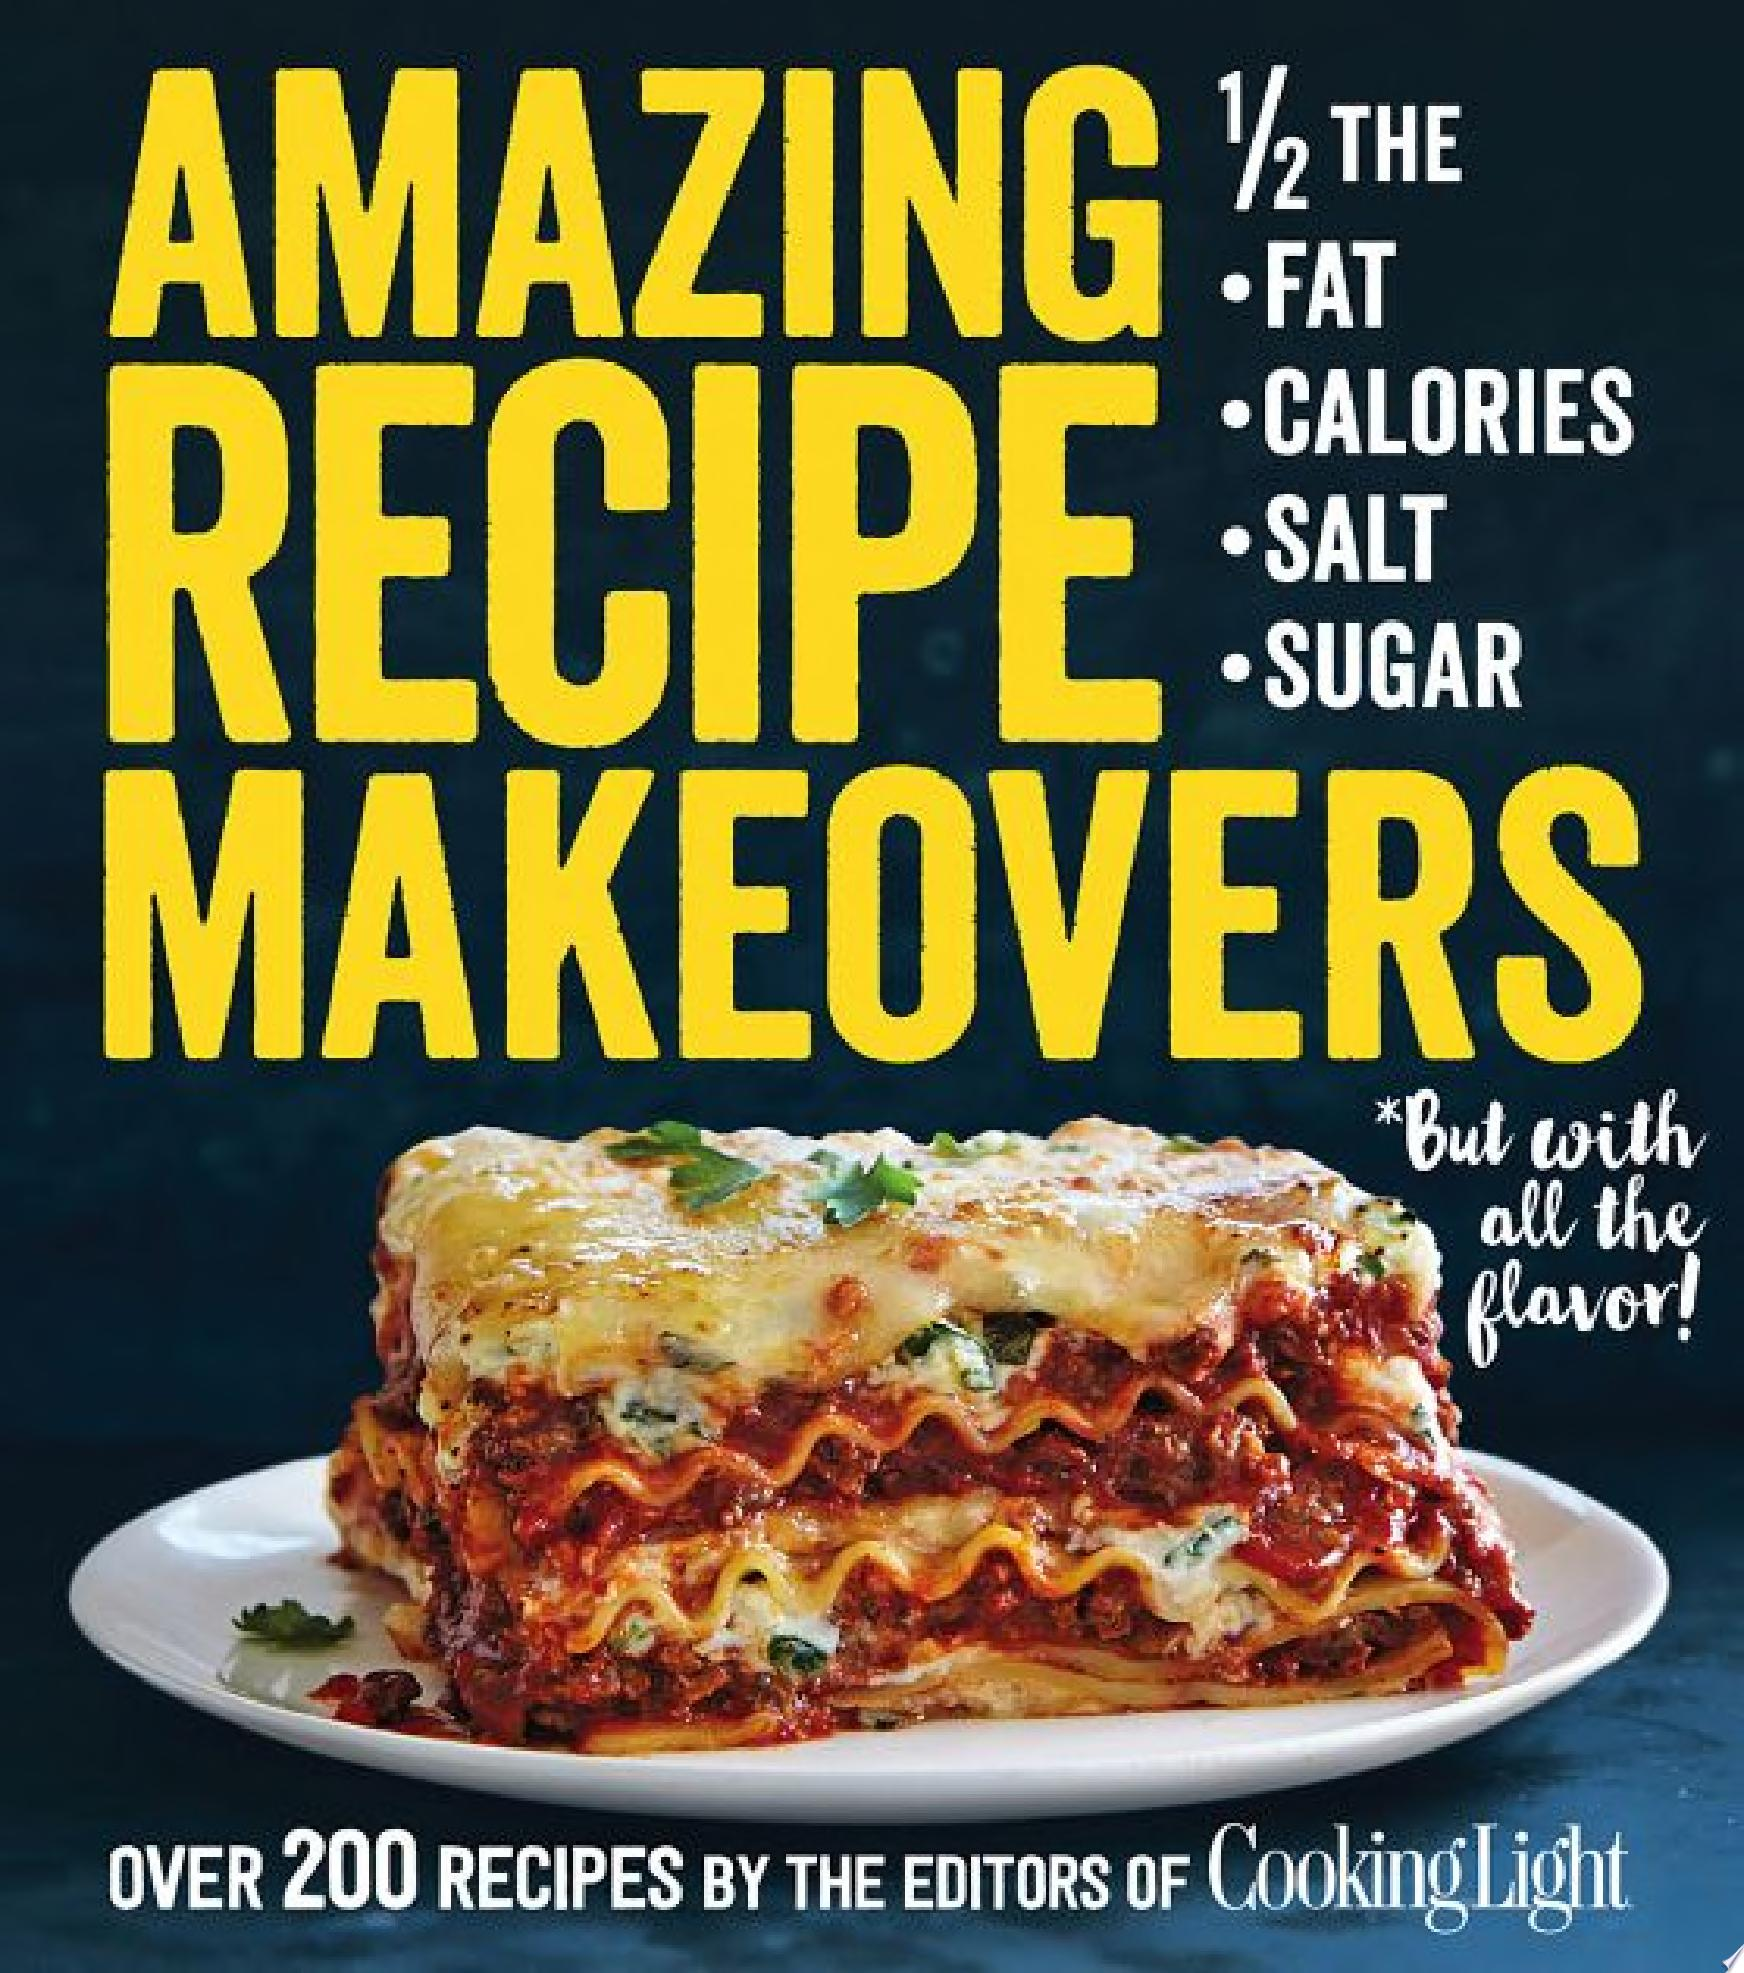 Amazing Recipe Makeovers